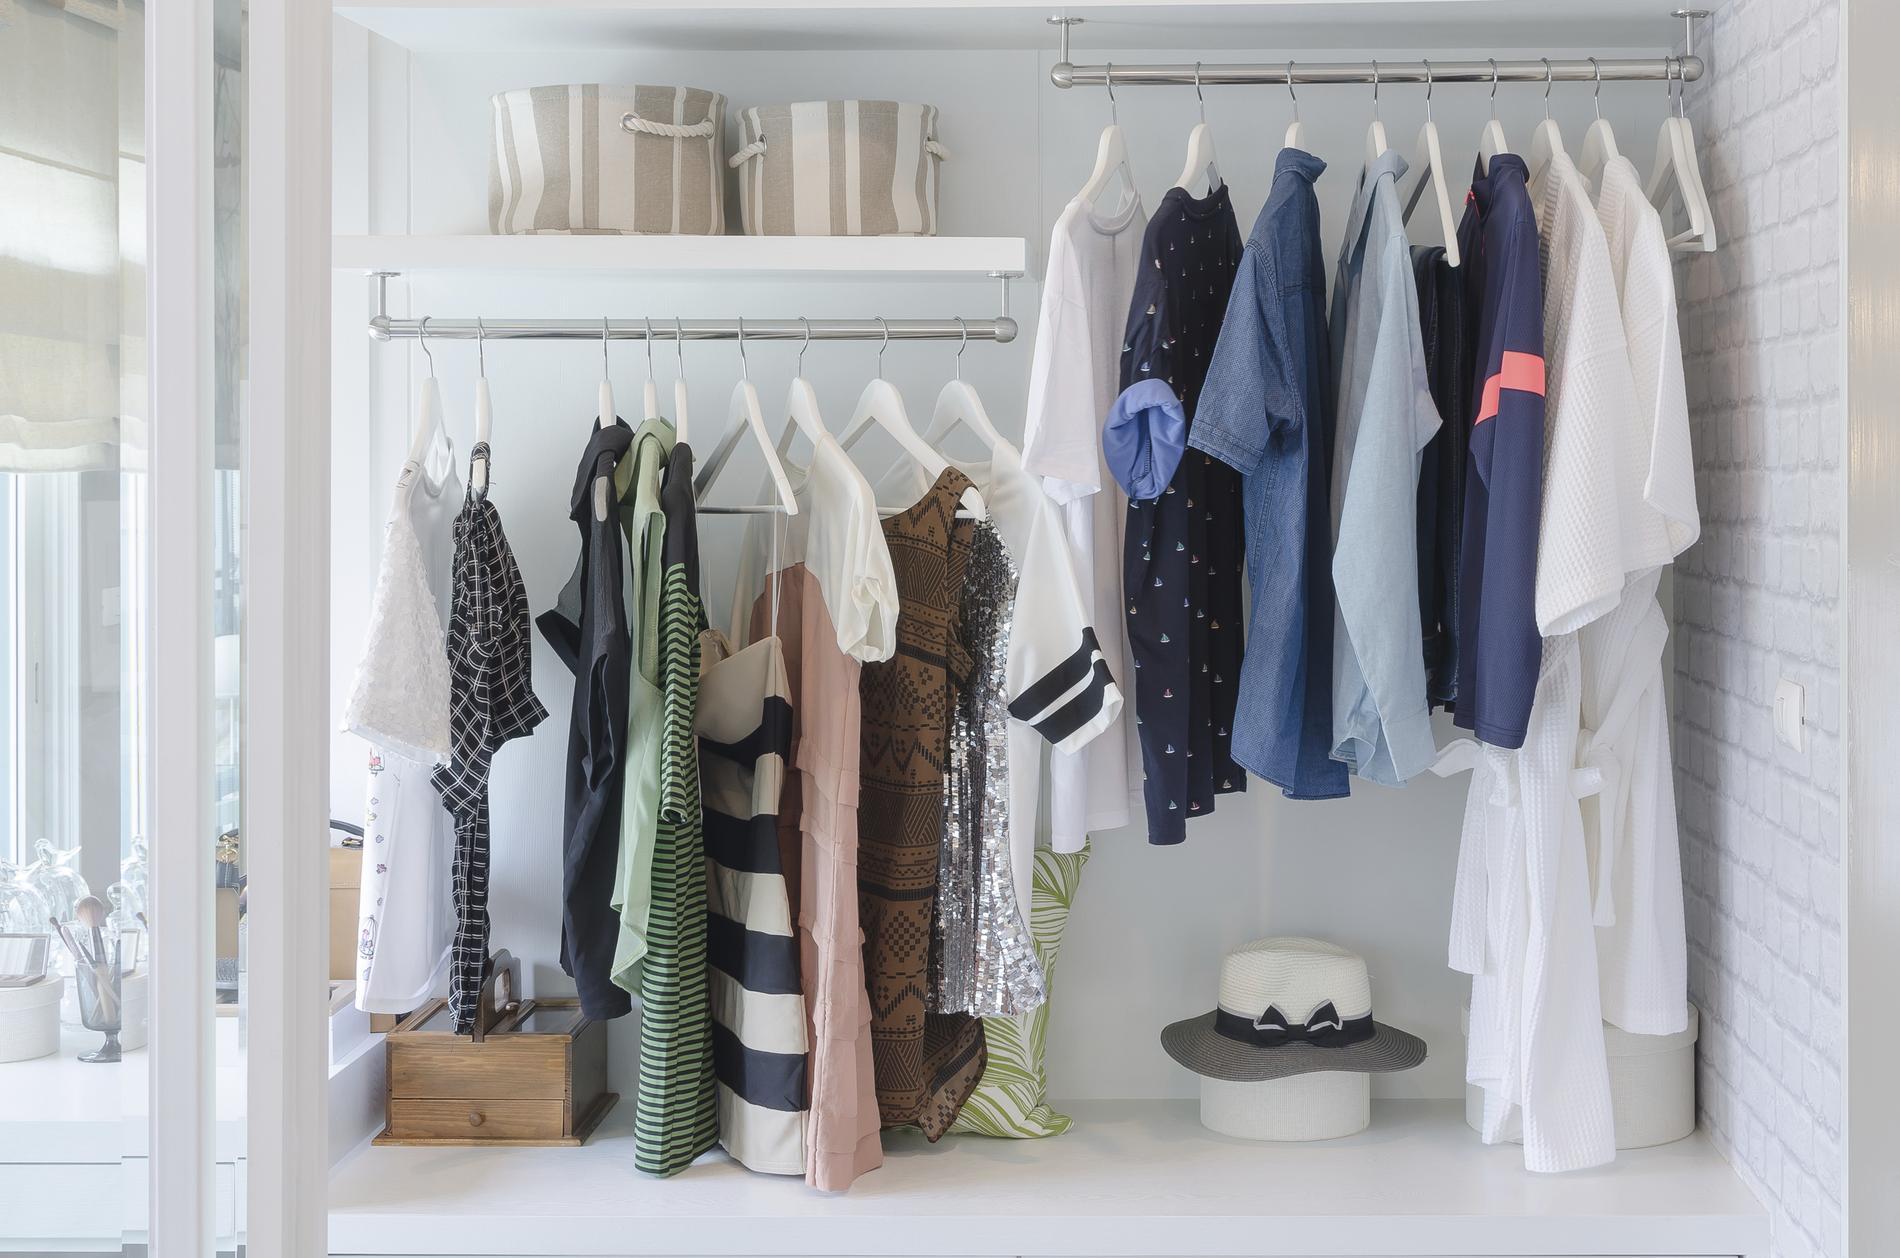 le dressing 333 la garde robe minimaliste adapt e la saison madame figaro. Black Bedroom Furniture Sets. Home Design Ideas